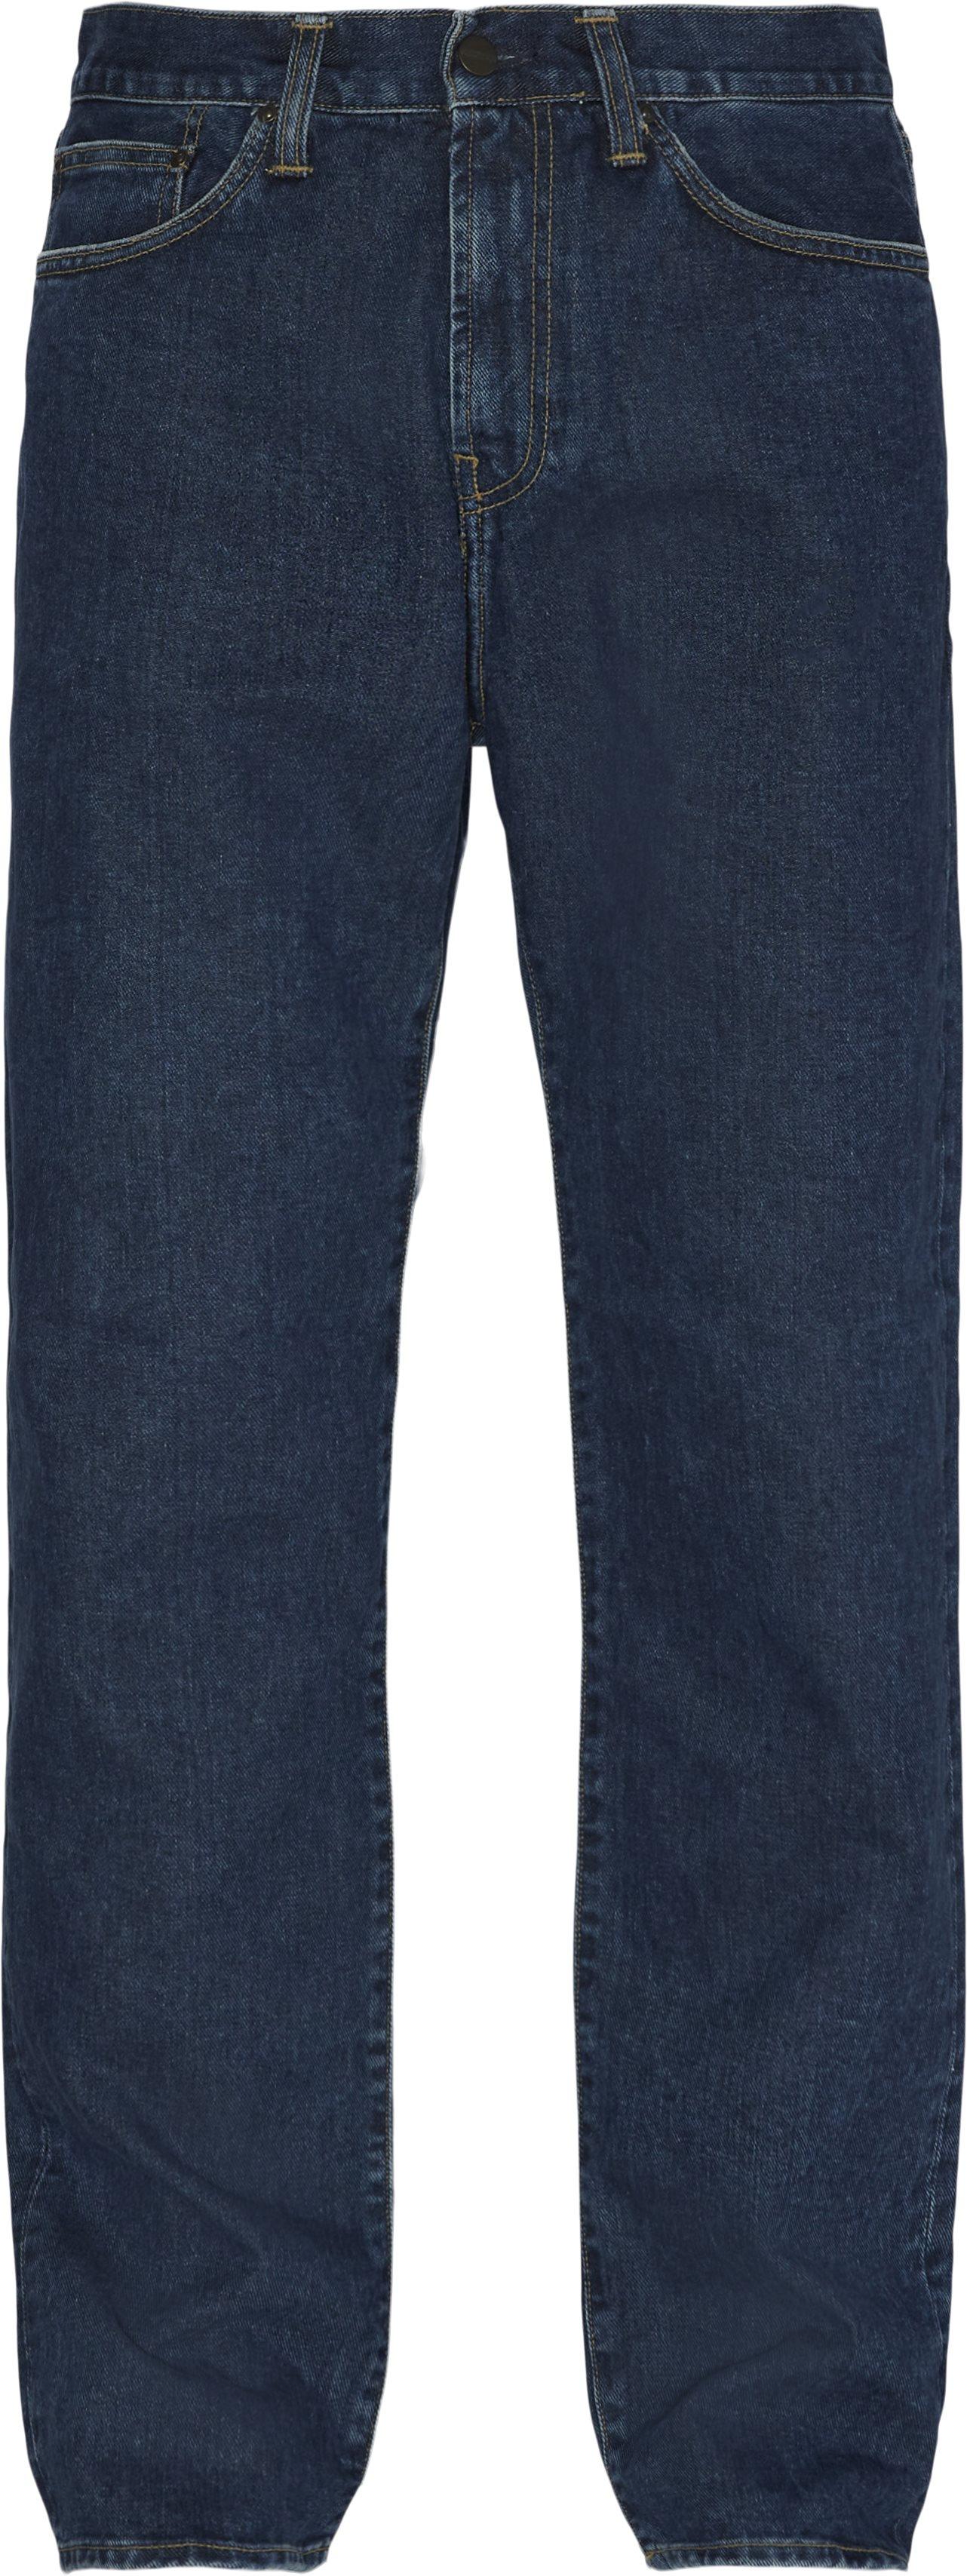 Jeans - Blue